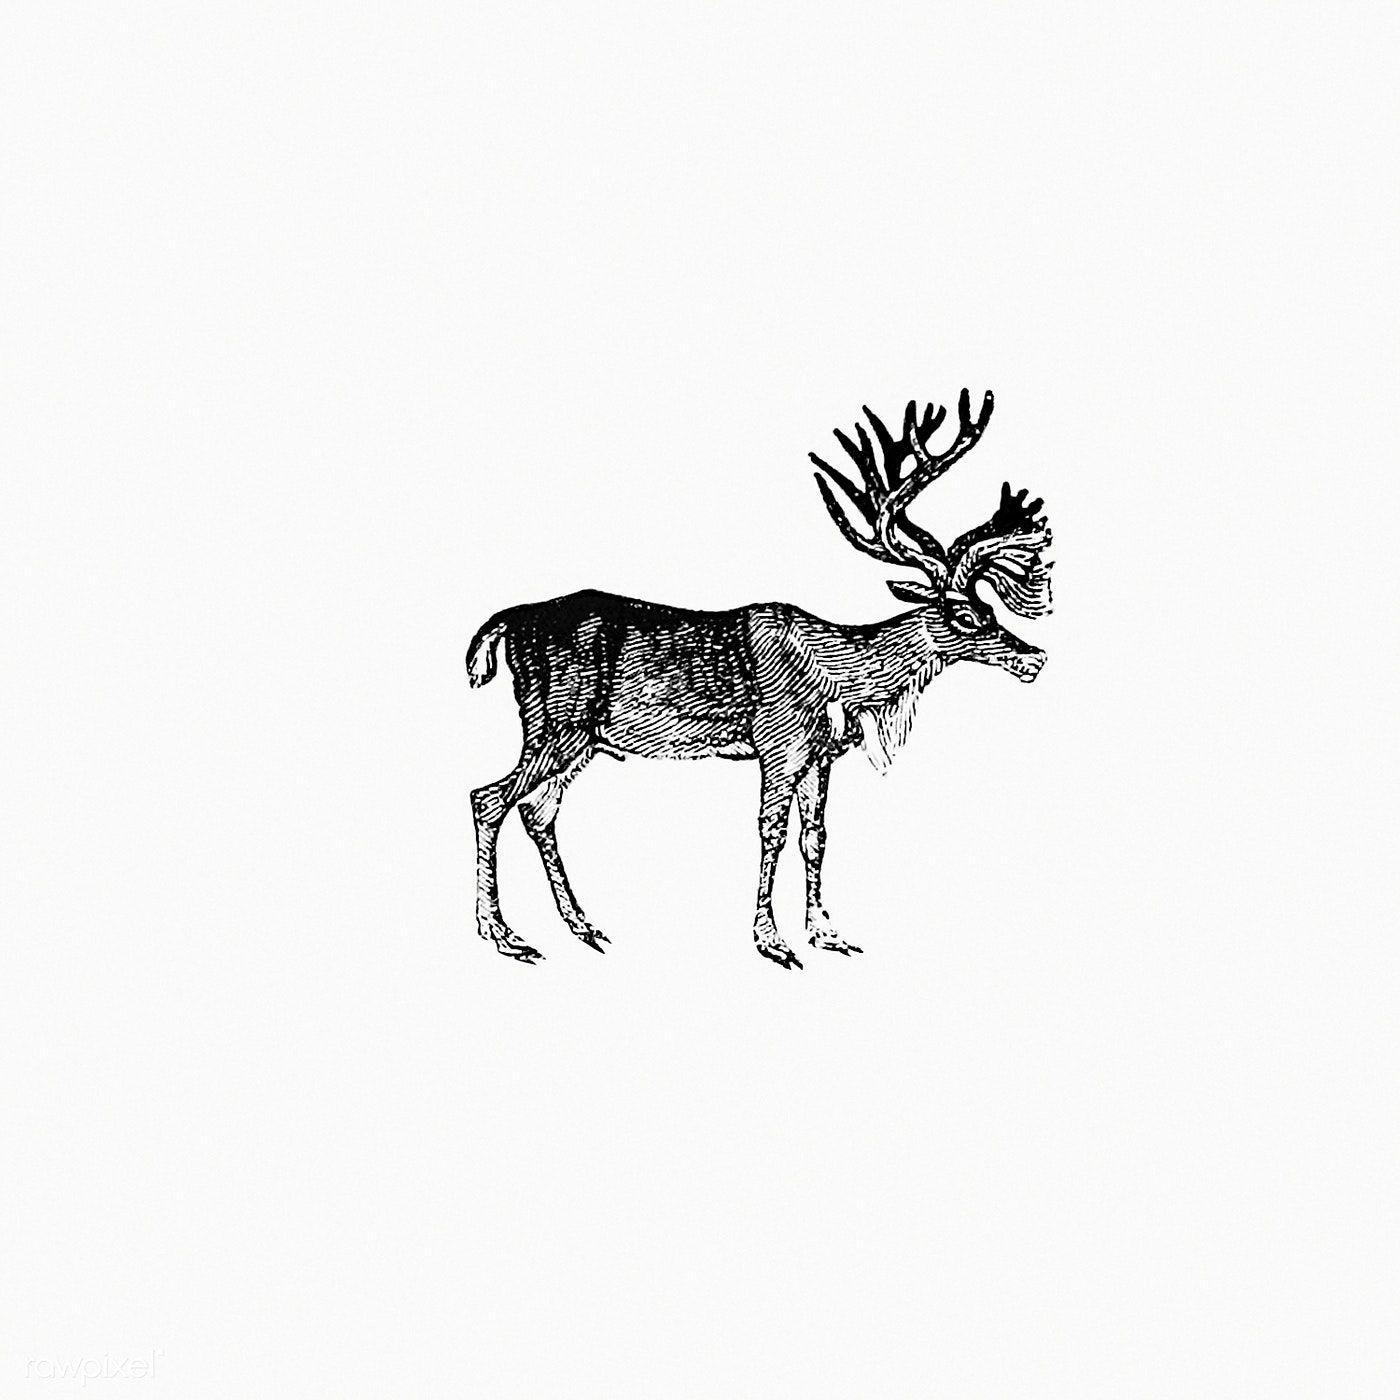 Download Free Illustration Of Reindeer Illustration From The Polar Regions Download Illustration Polar R In 2020 Free Illustrations Illustration Vintage Reindeer